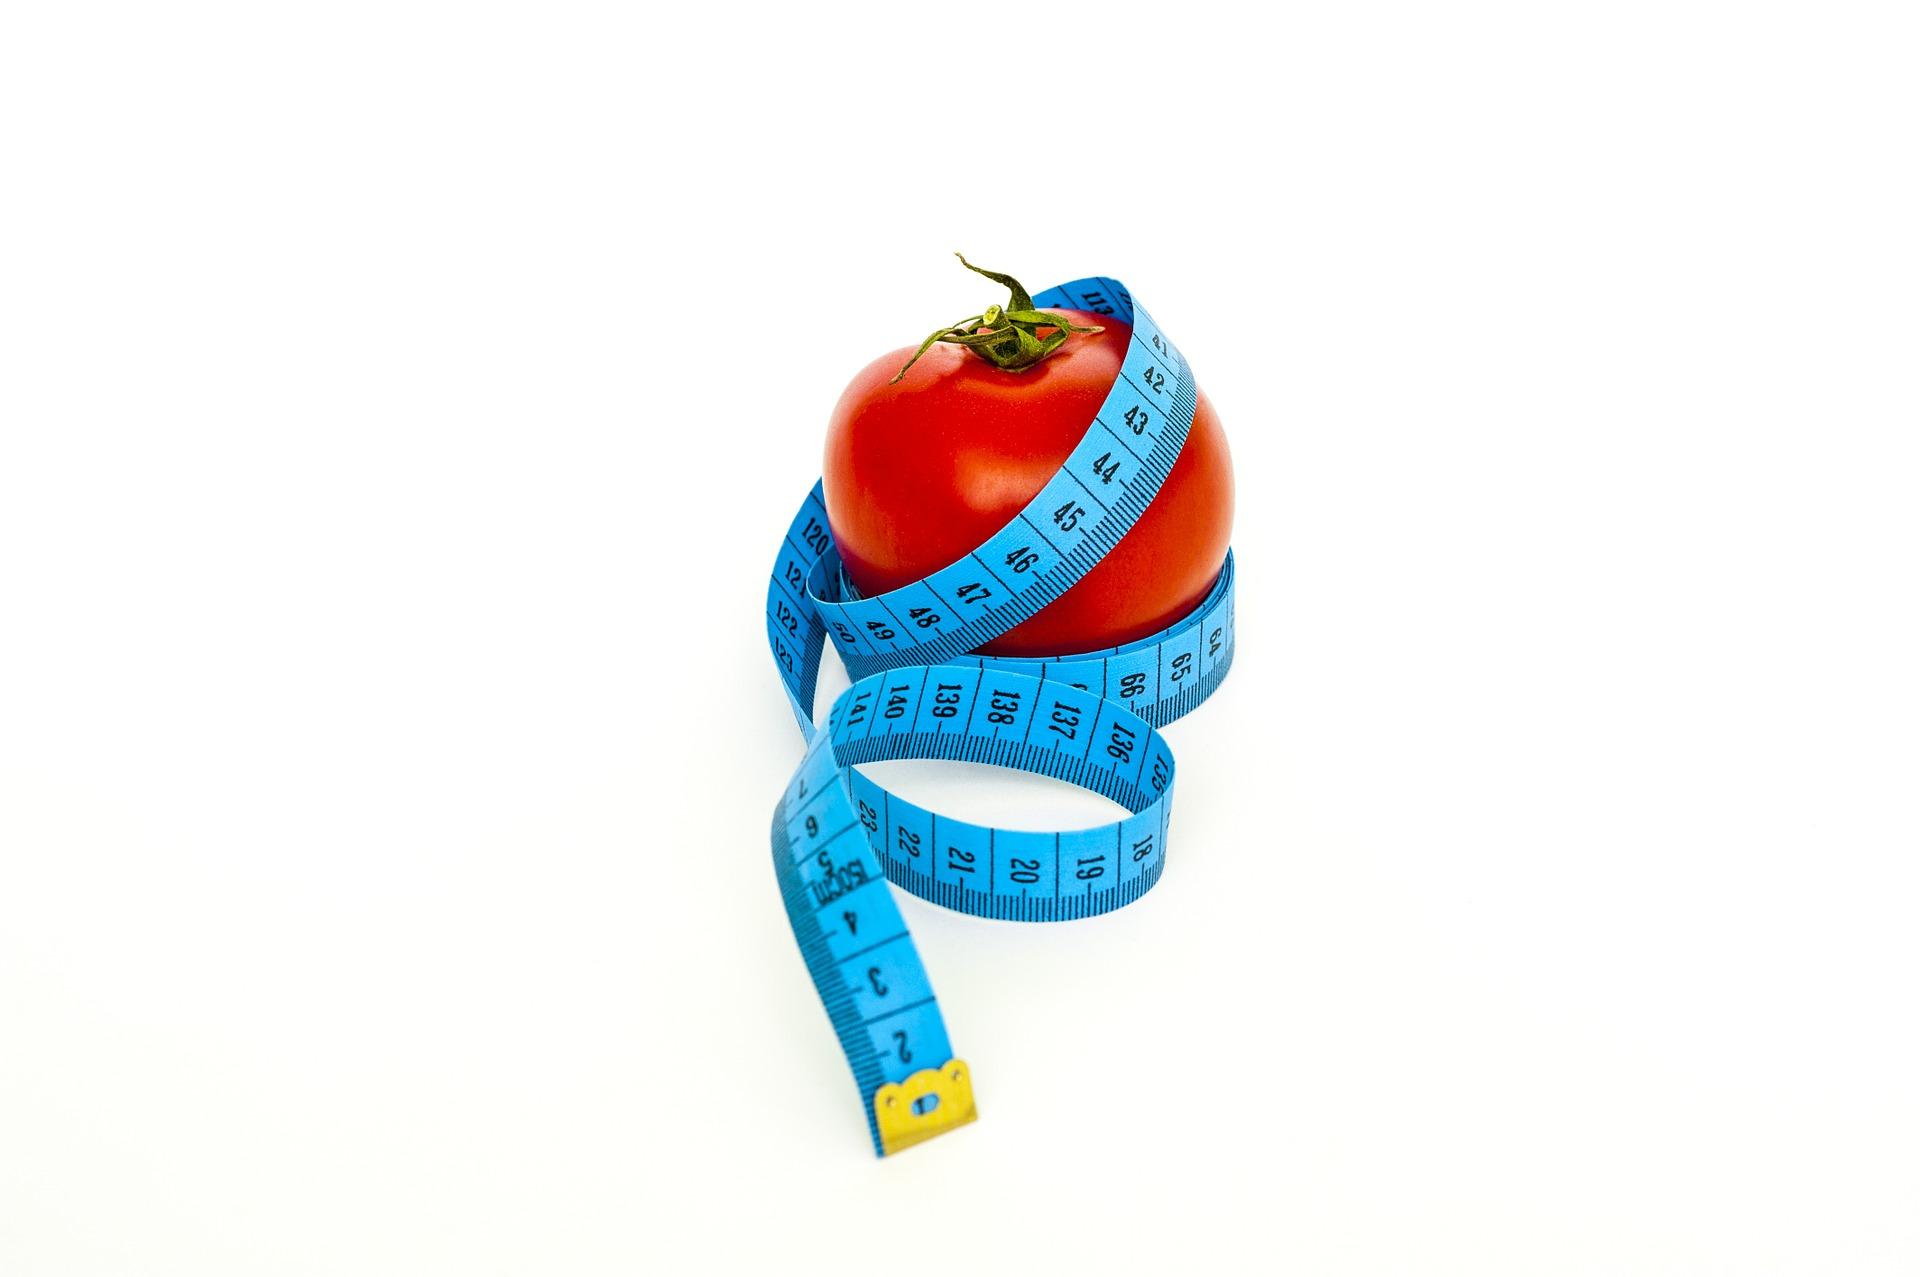 jablko a metr